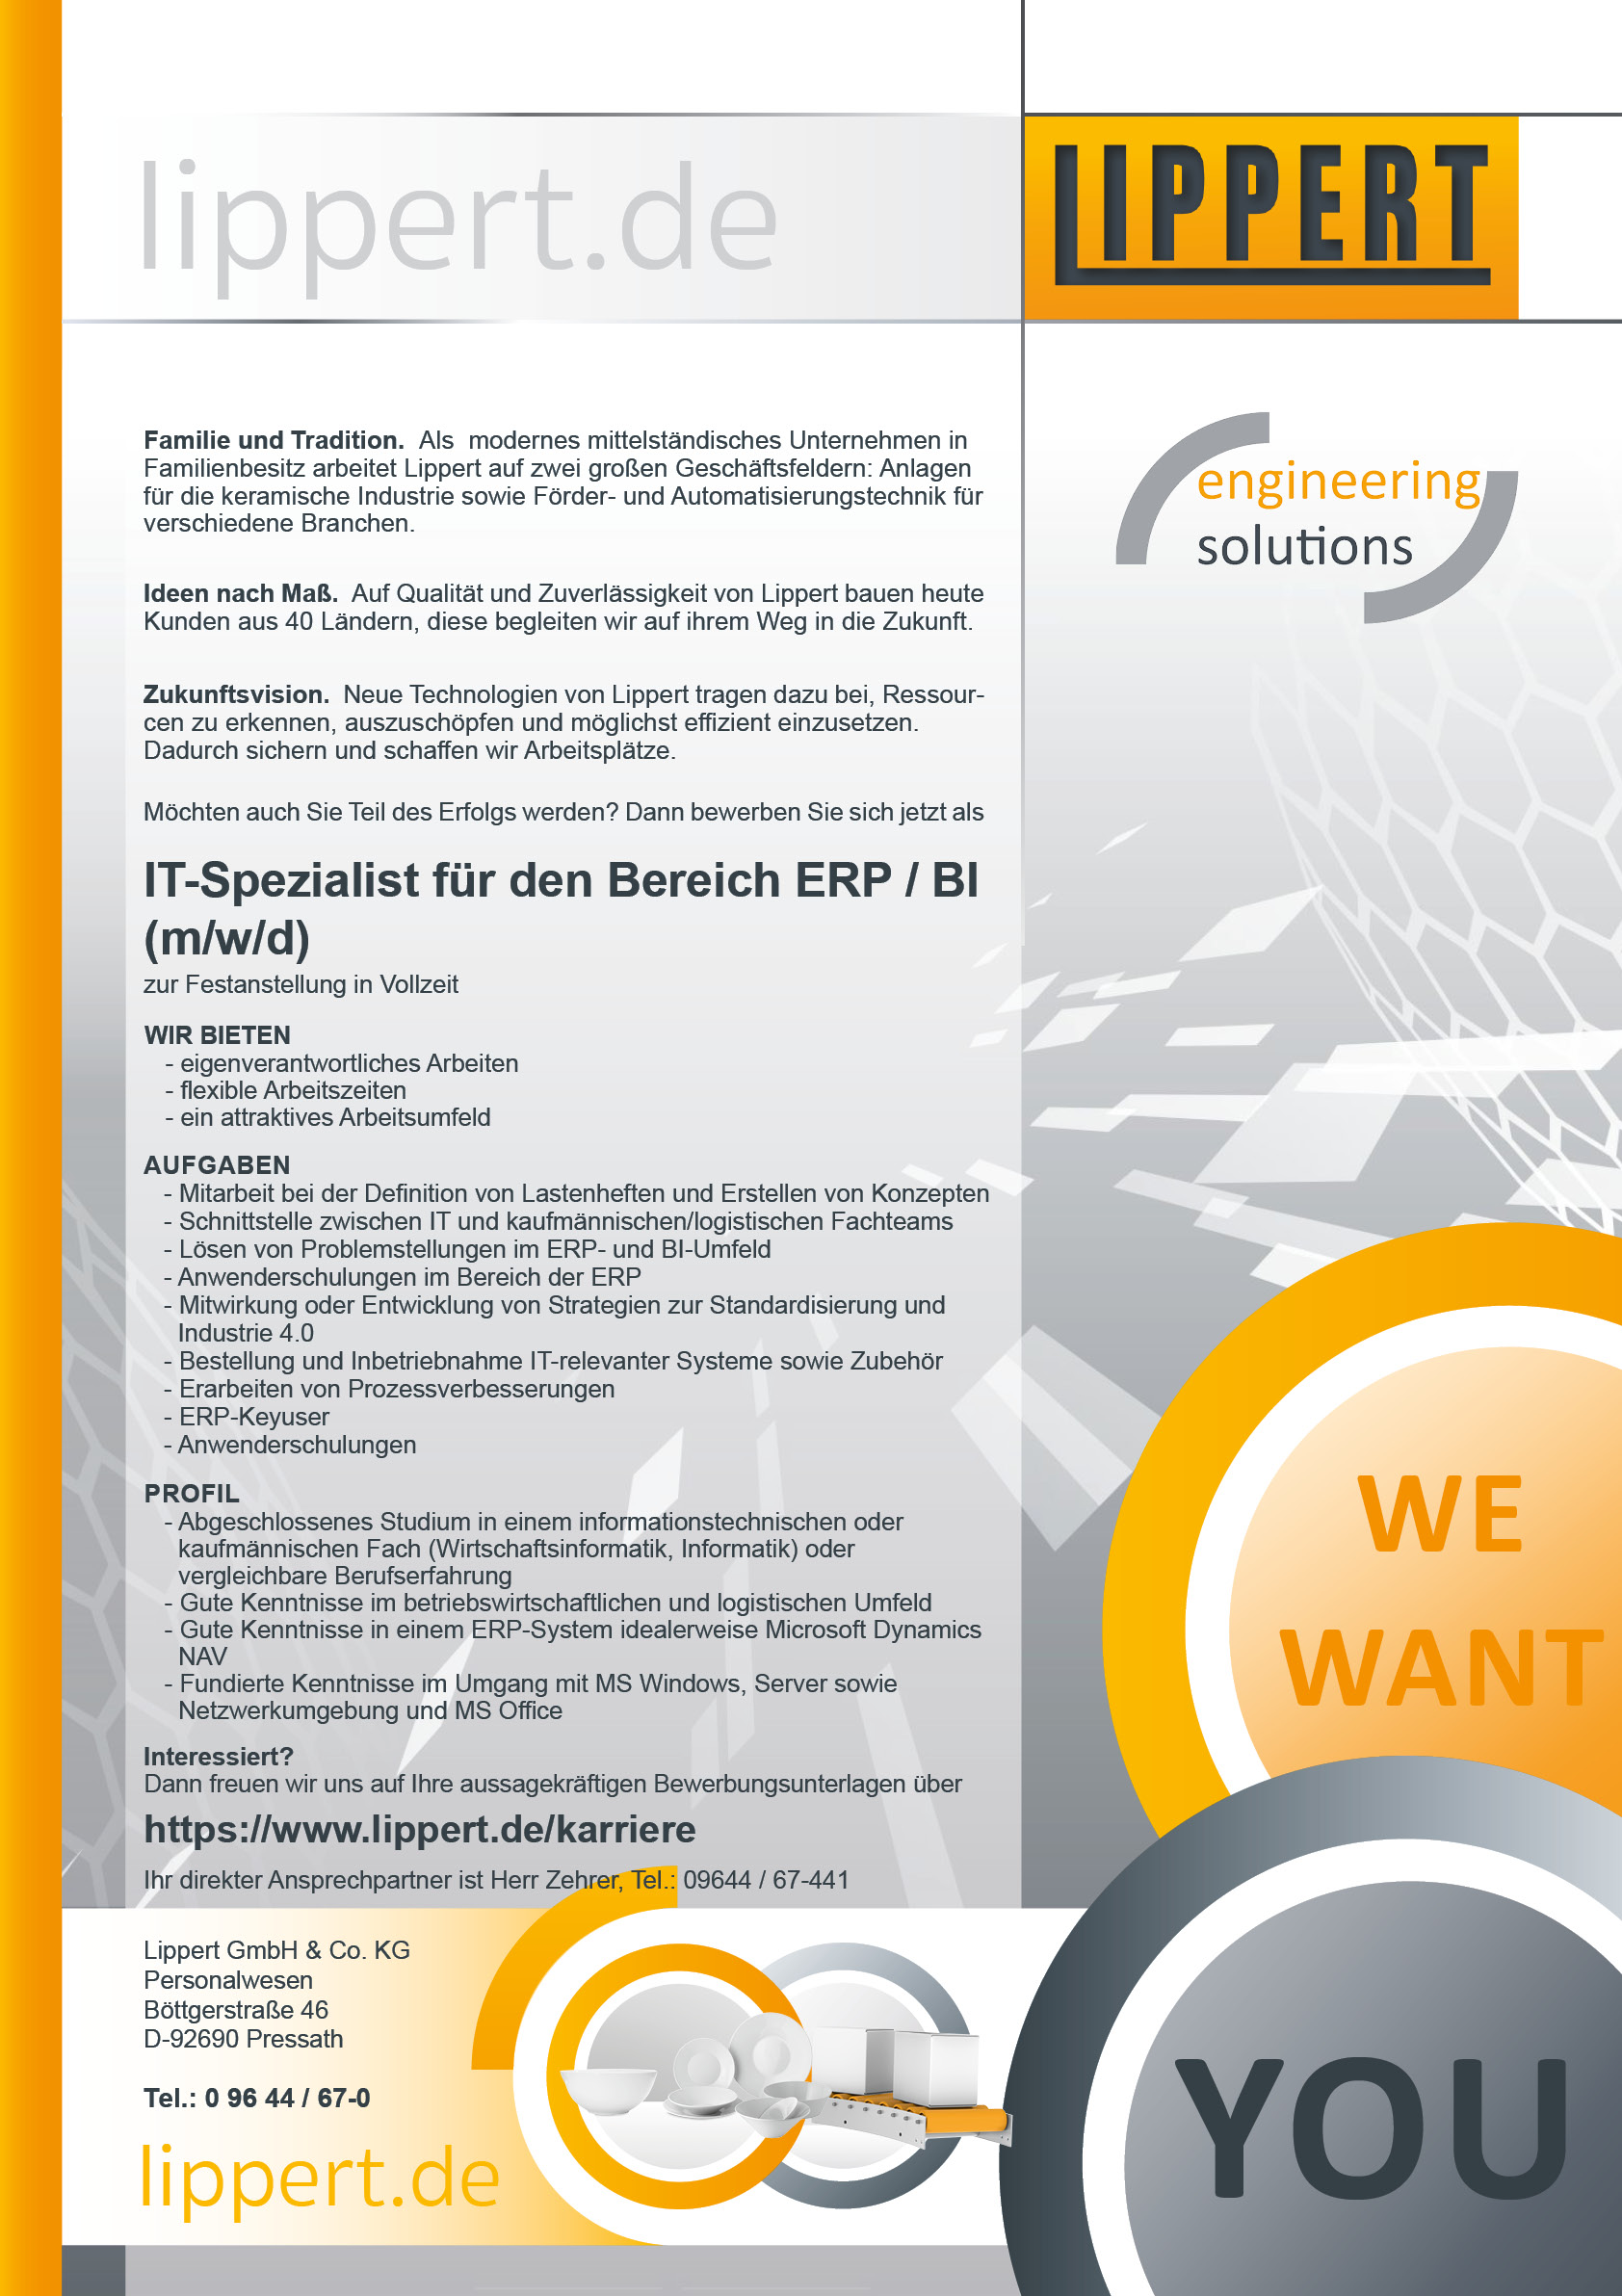 IT-Spezialist Bereich ERP/BI (m/w/d)